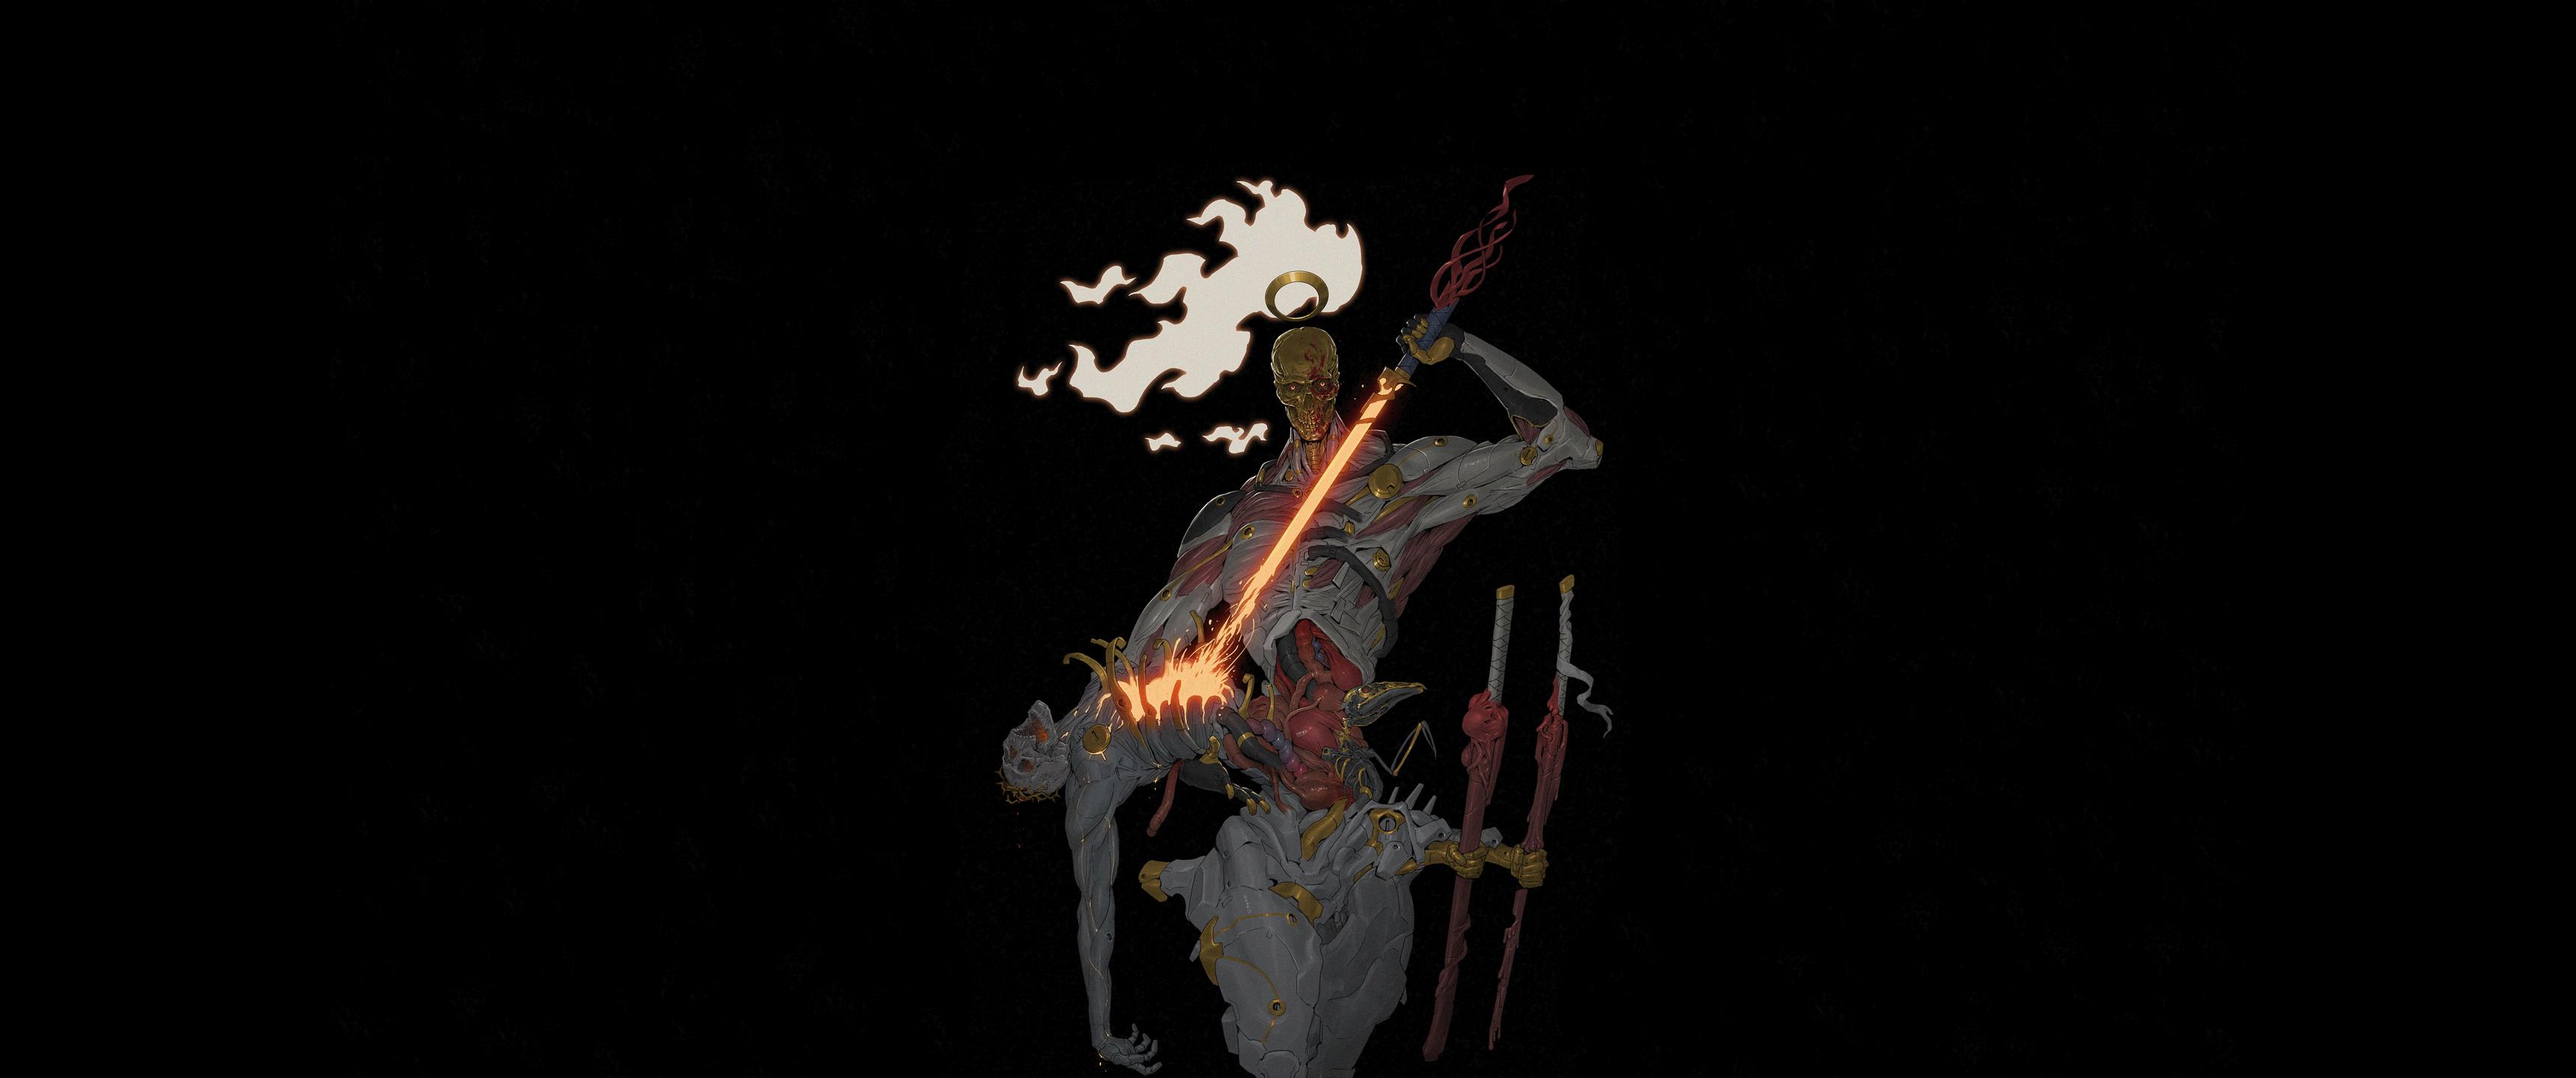 Anime 3440x1440 katana minimalism black background fantasy art artwork frontal view